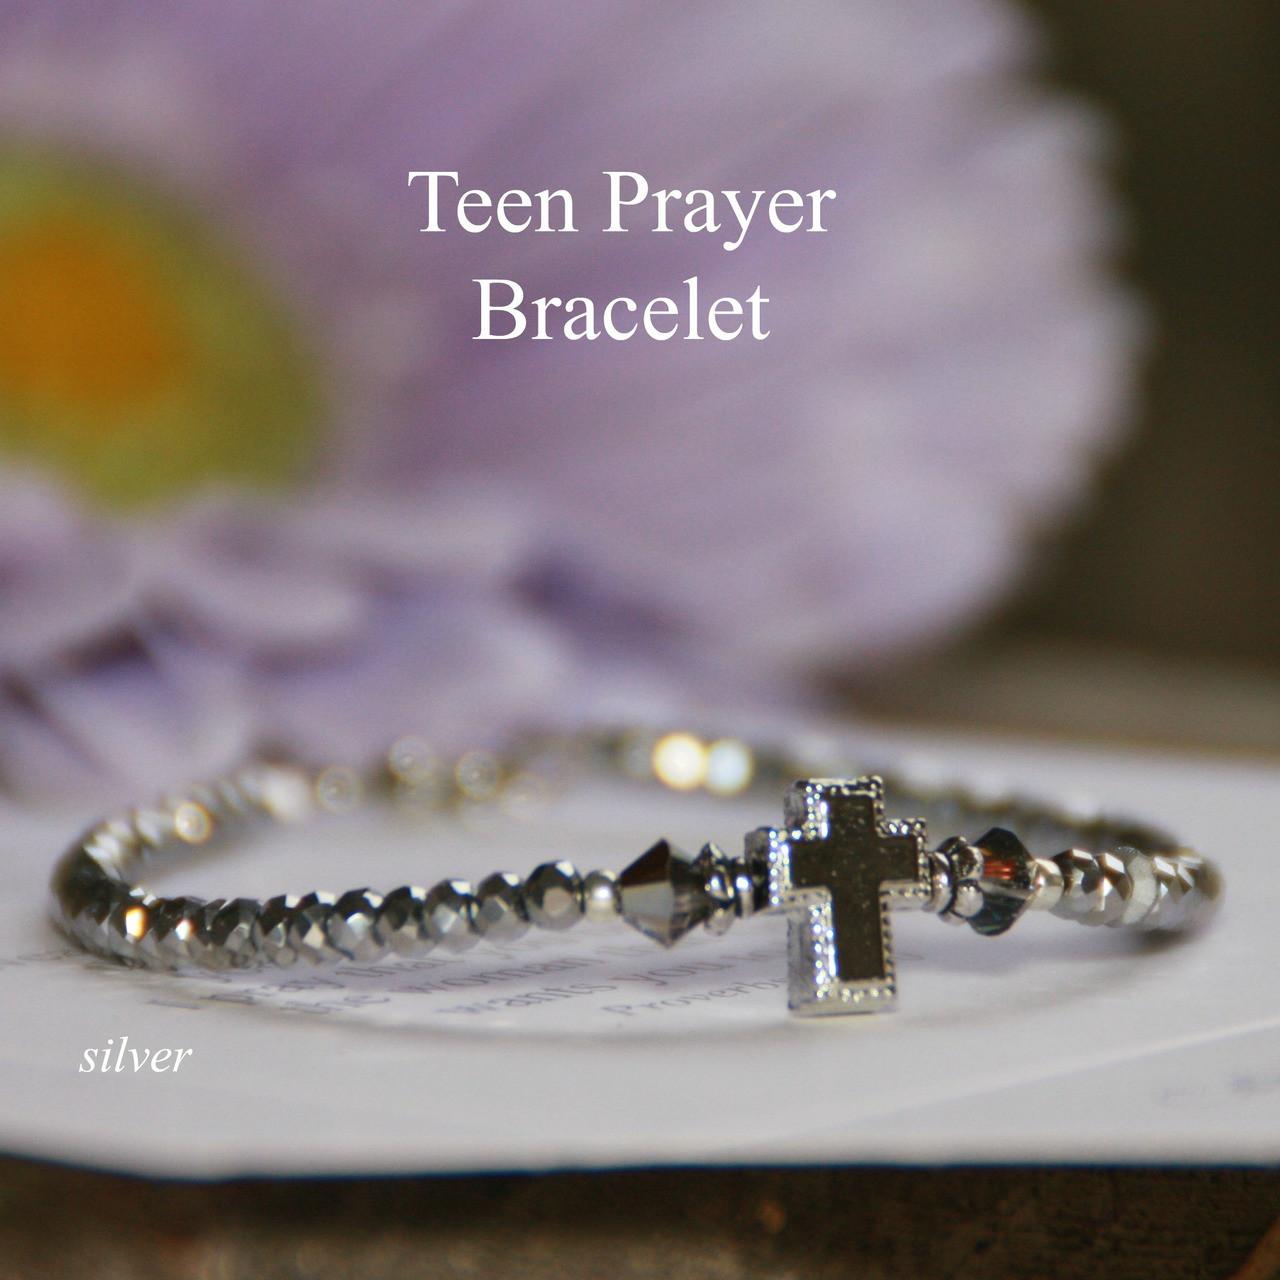 TN-5  Teen Prayer Bracelet-Silver